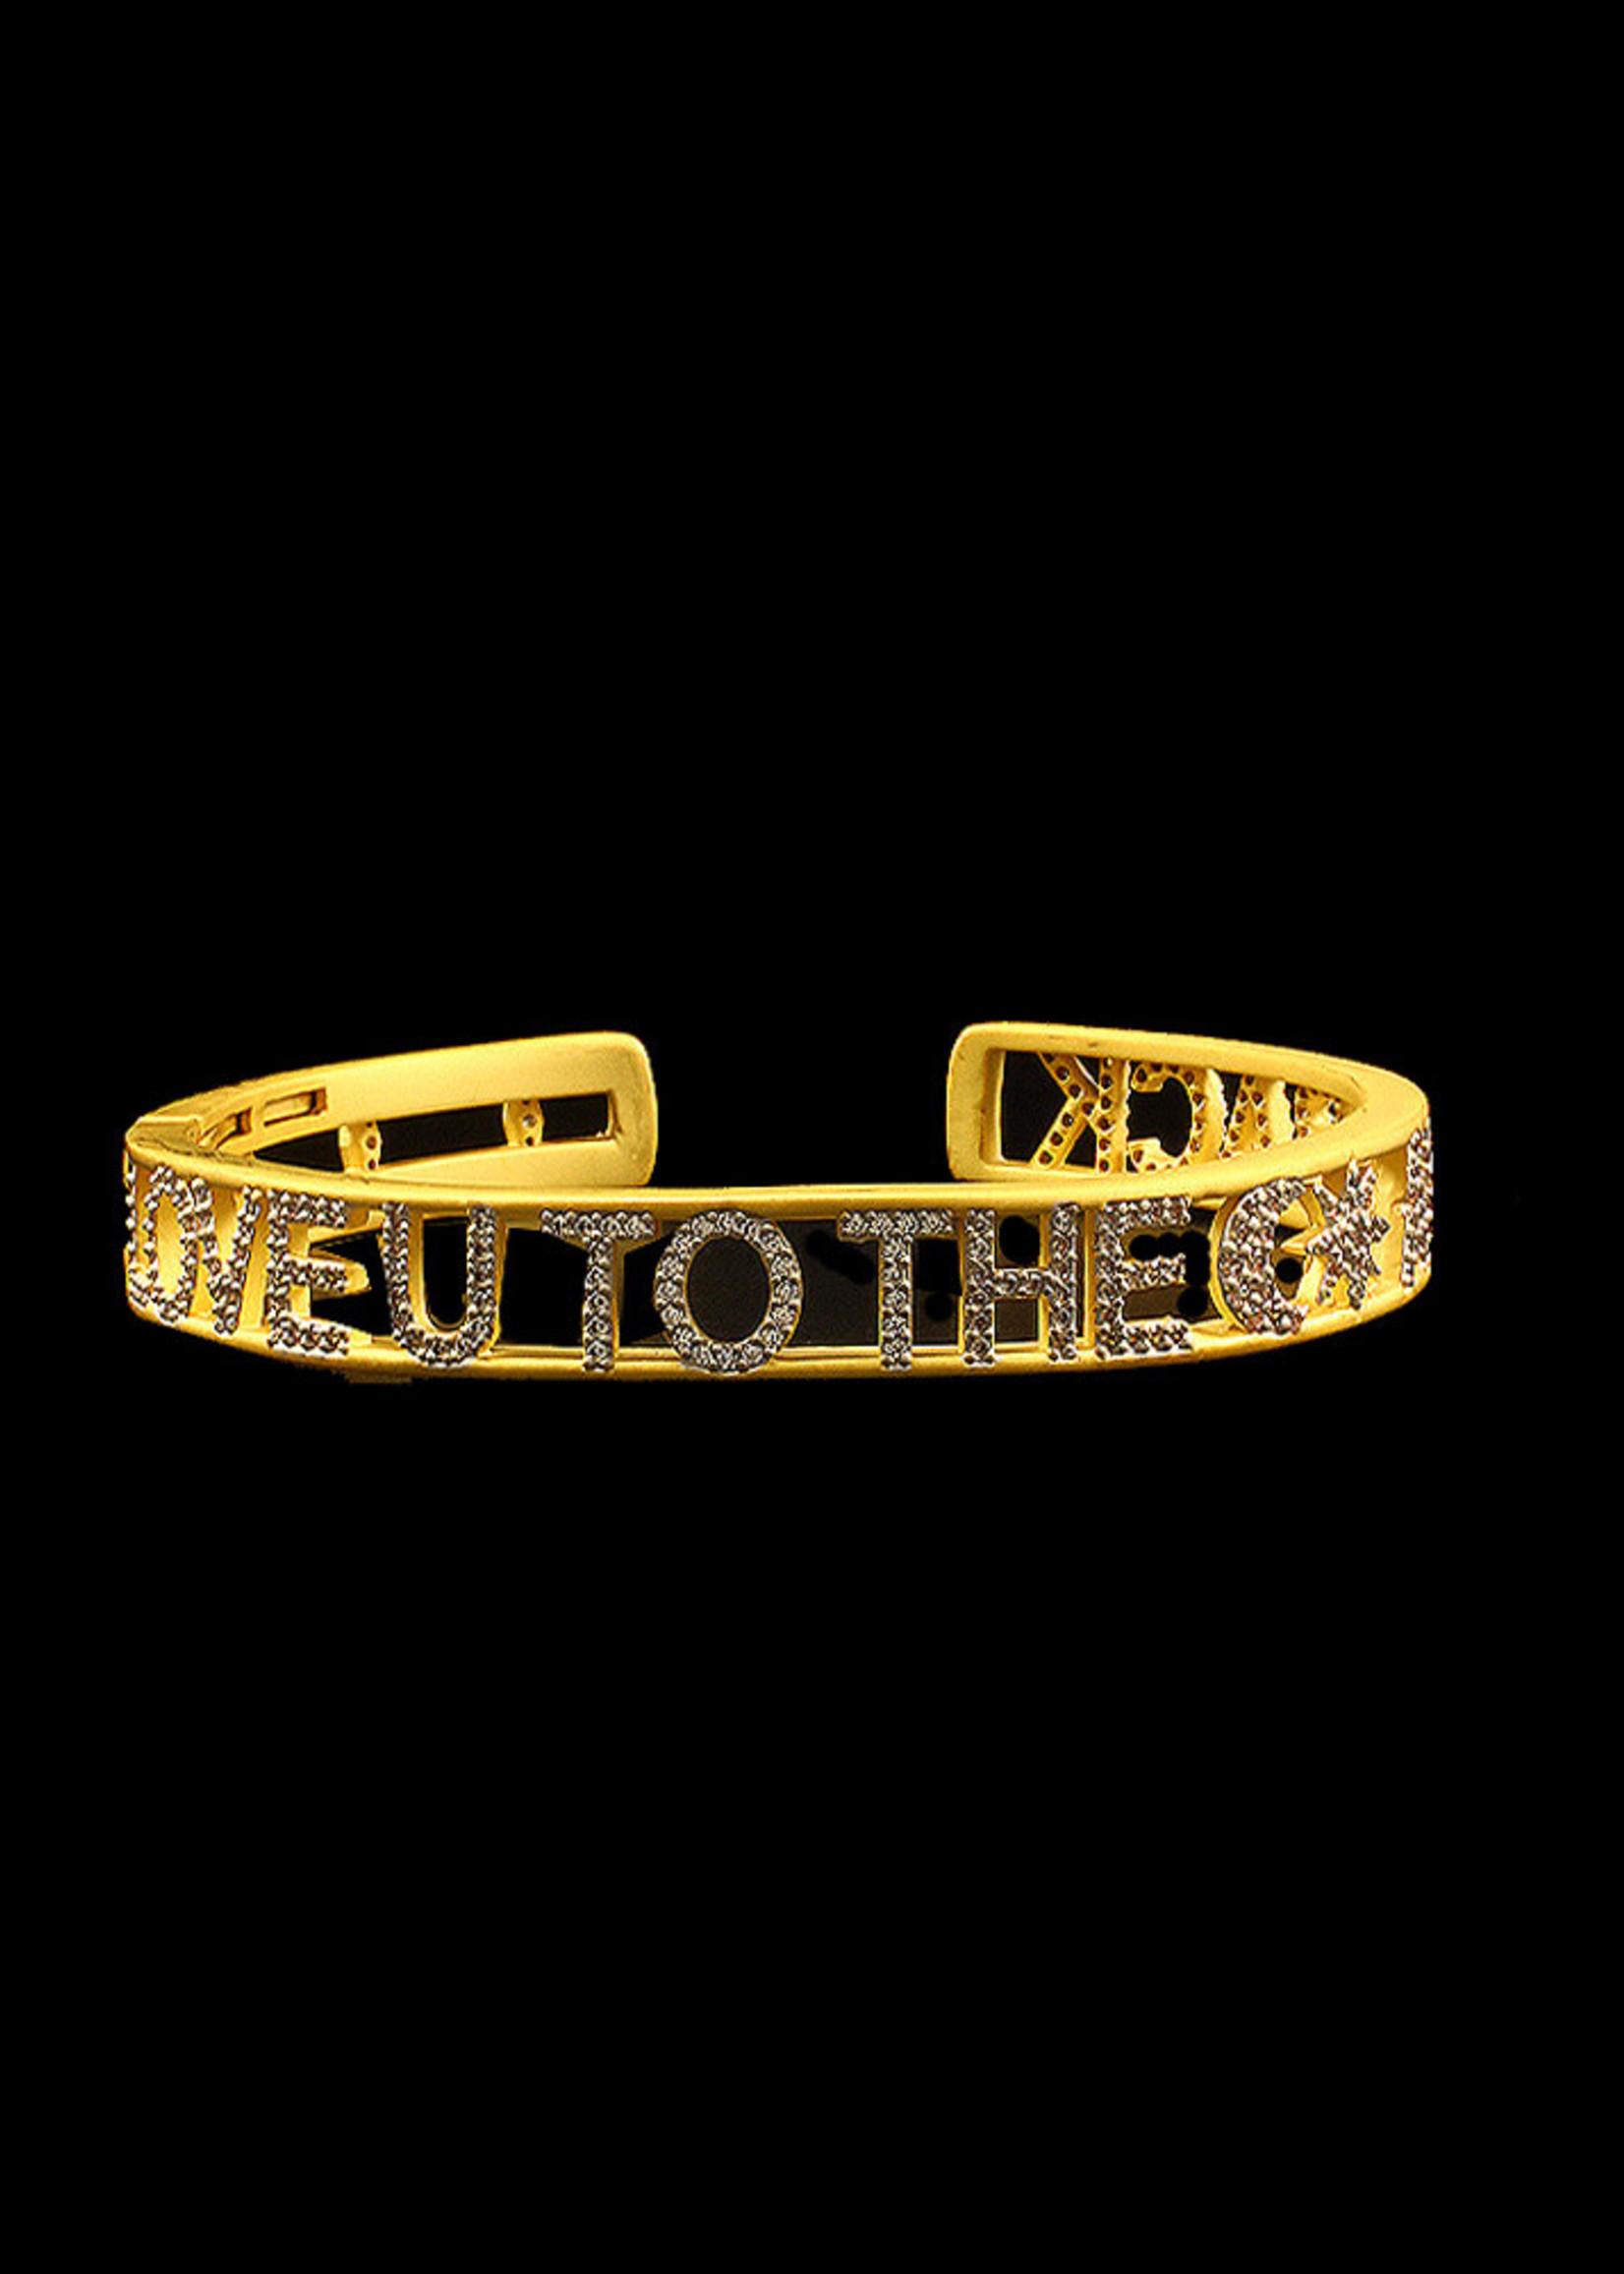 Be-Je Designs Beje - Love U to the Moon Bracelet (PU0925B)